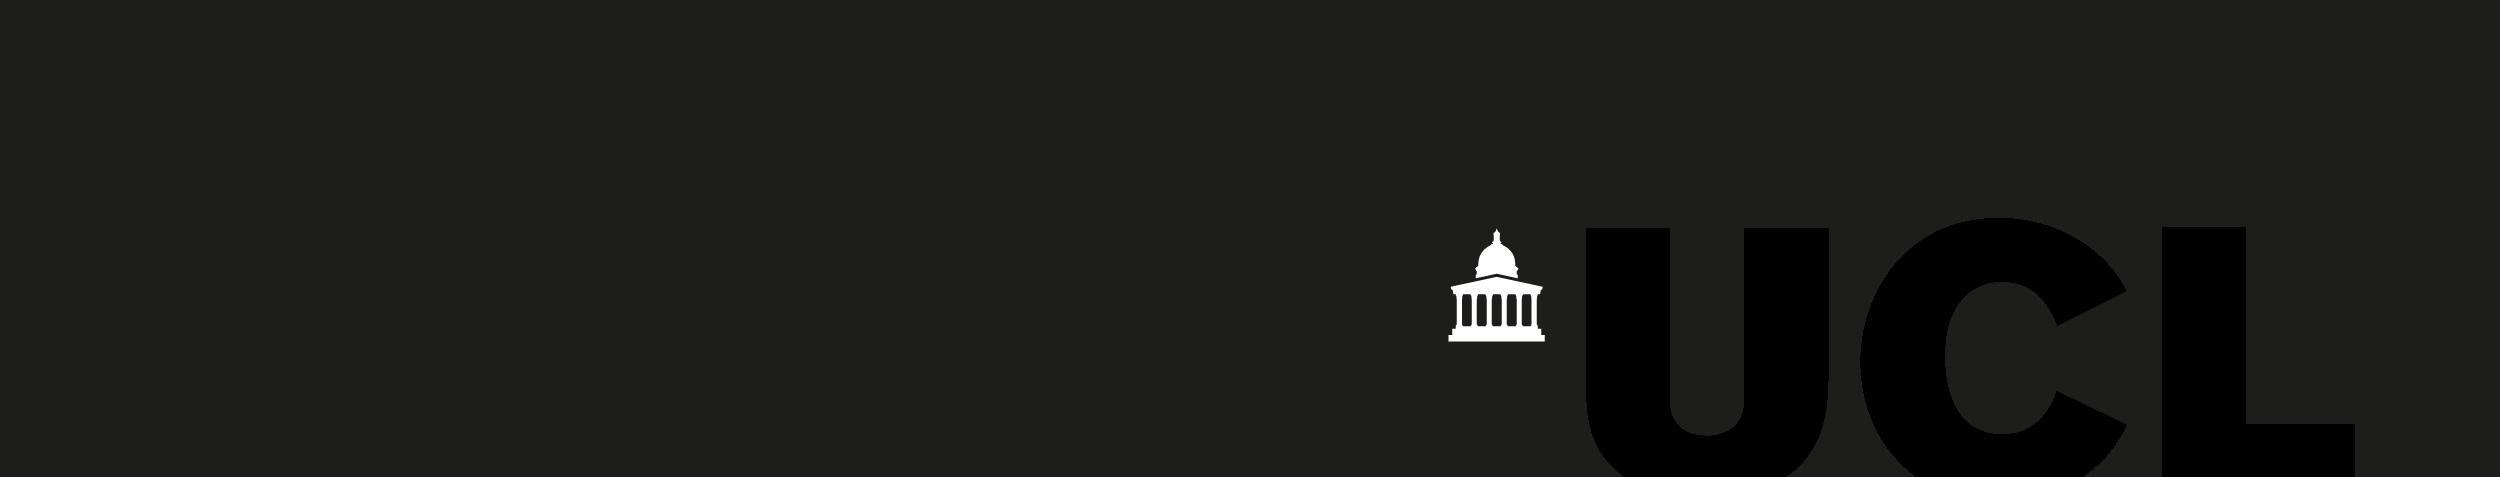 ucl-banner-port-black-rgb-lg.png